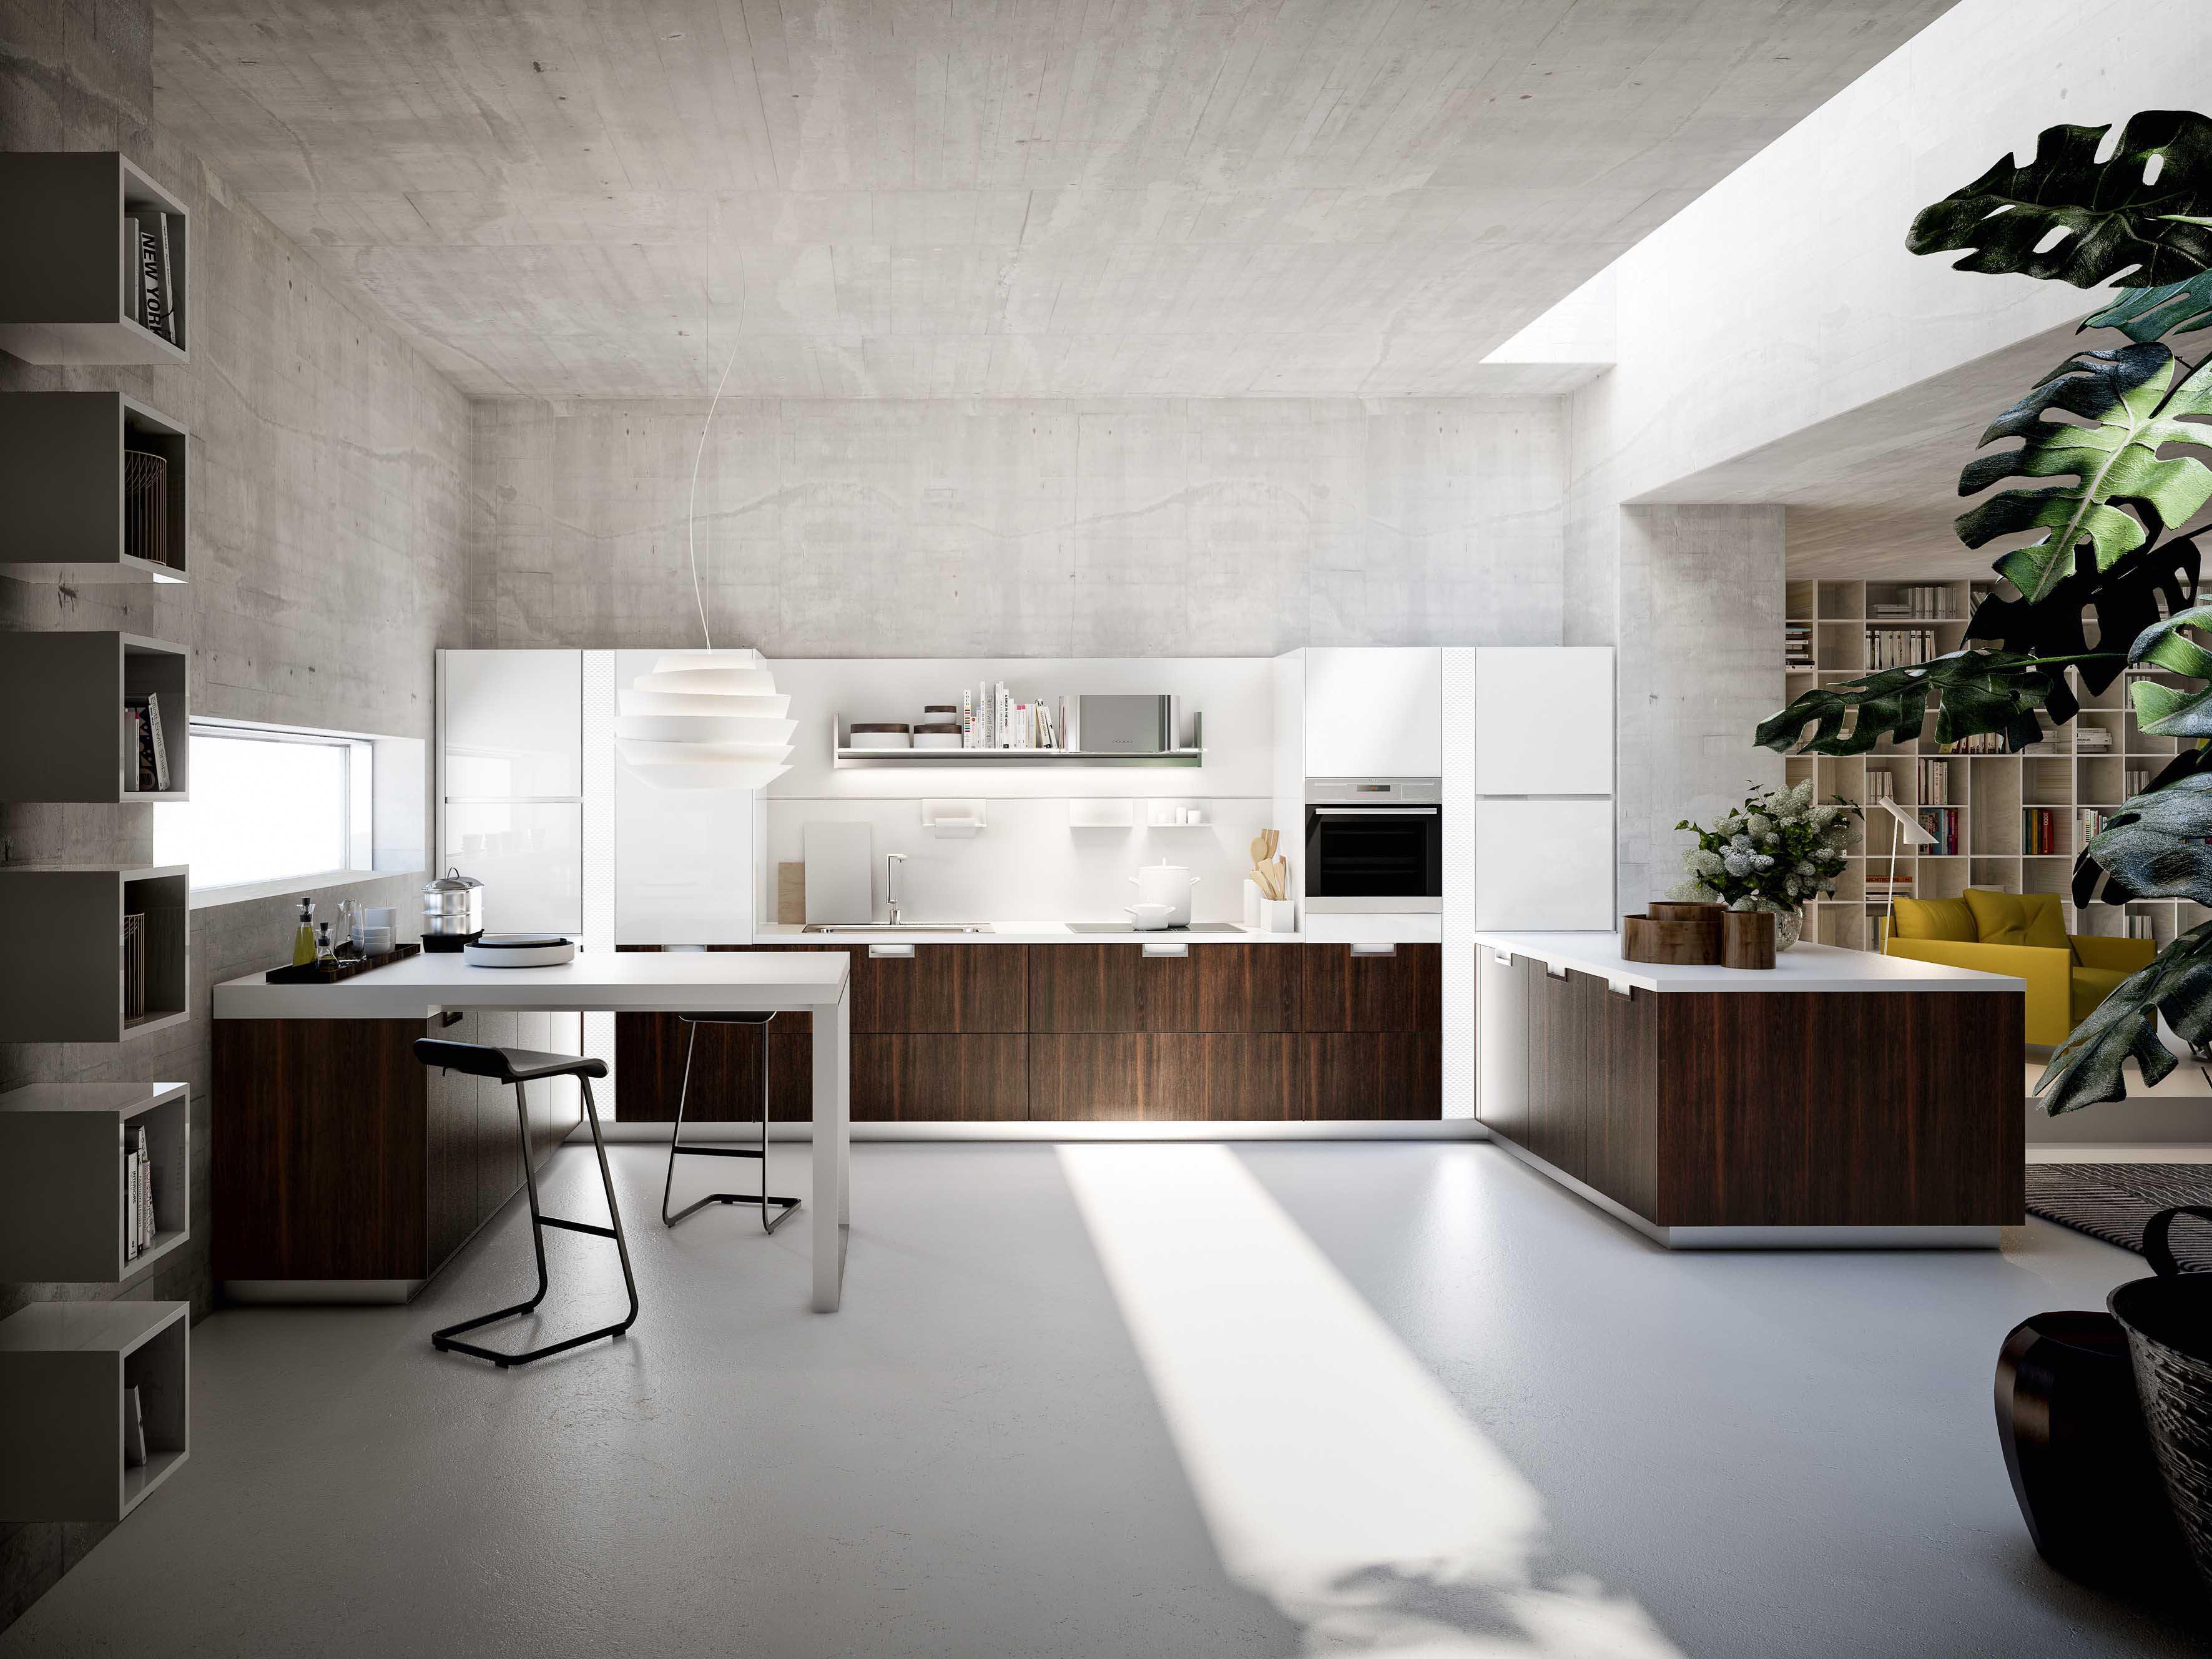 Arredamento cucine idee e consigli per mobili cucina - Bar design keuken ...